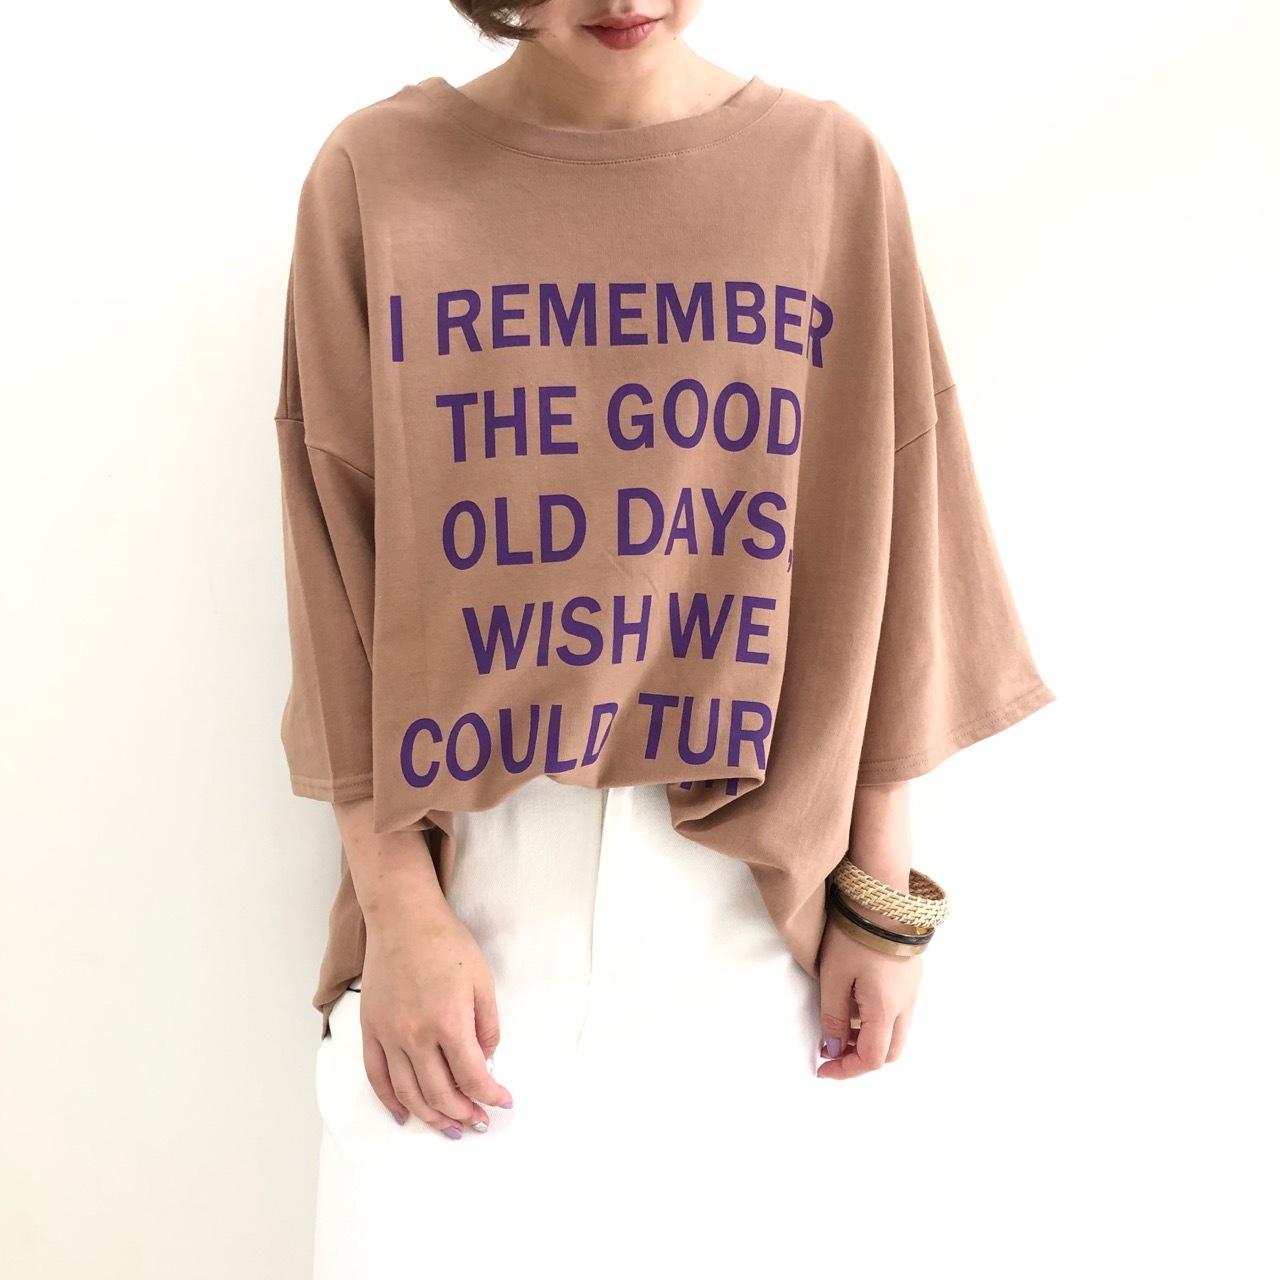 【 CHIGNONSTAR 】- 8192-026KK - 2WAYプリントTeeシャツ